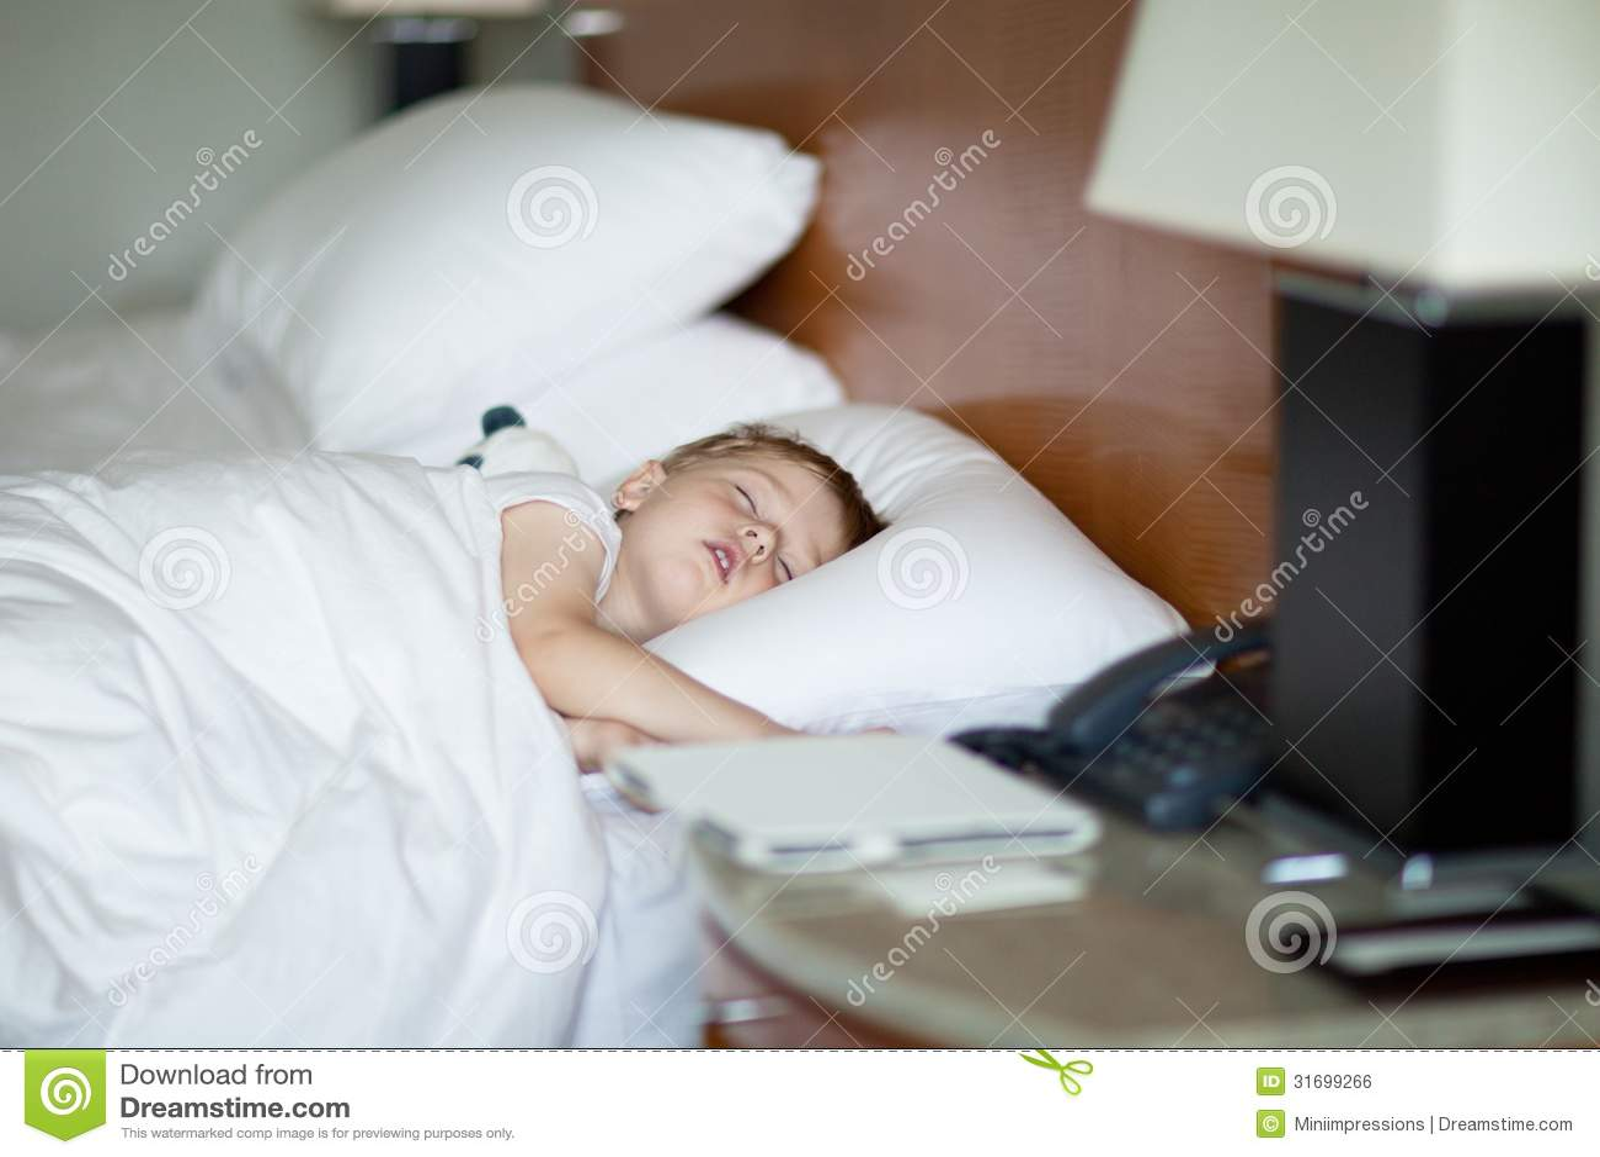 Cute Toddler Taking Nap Hotel Stock Image Calm